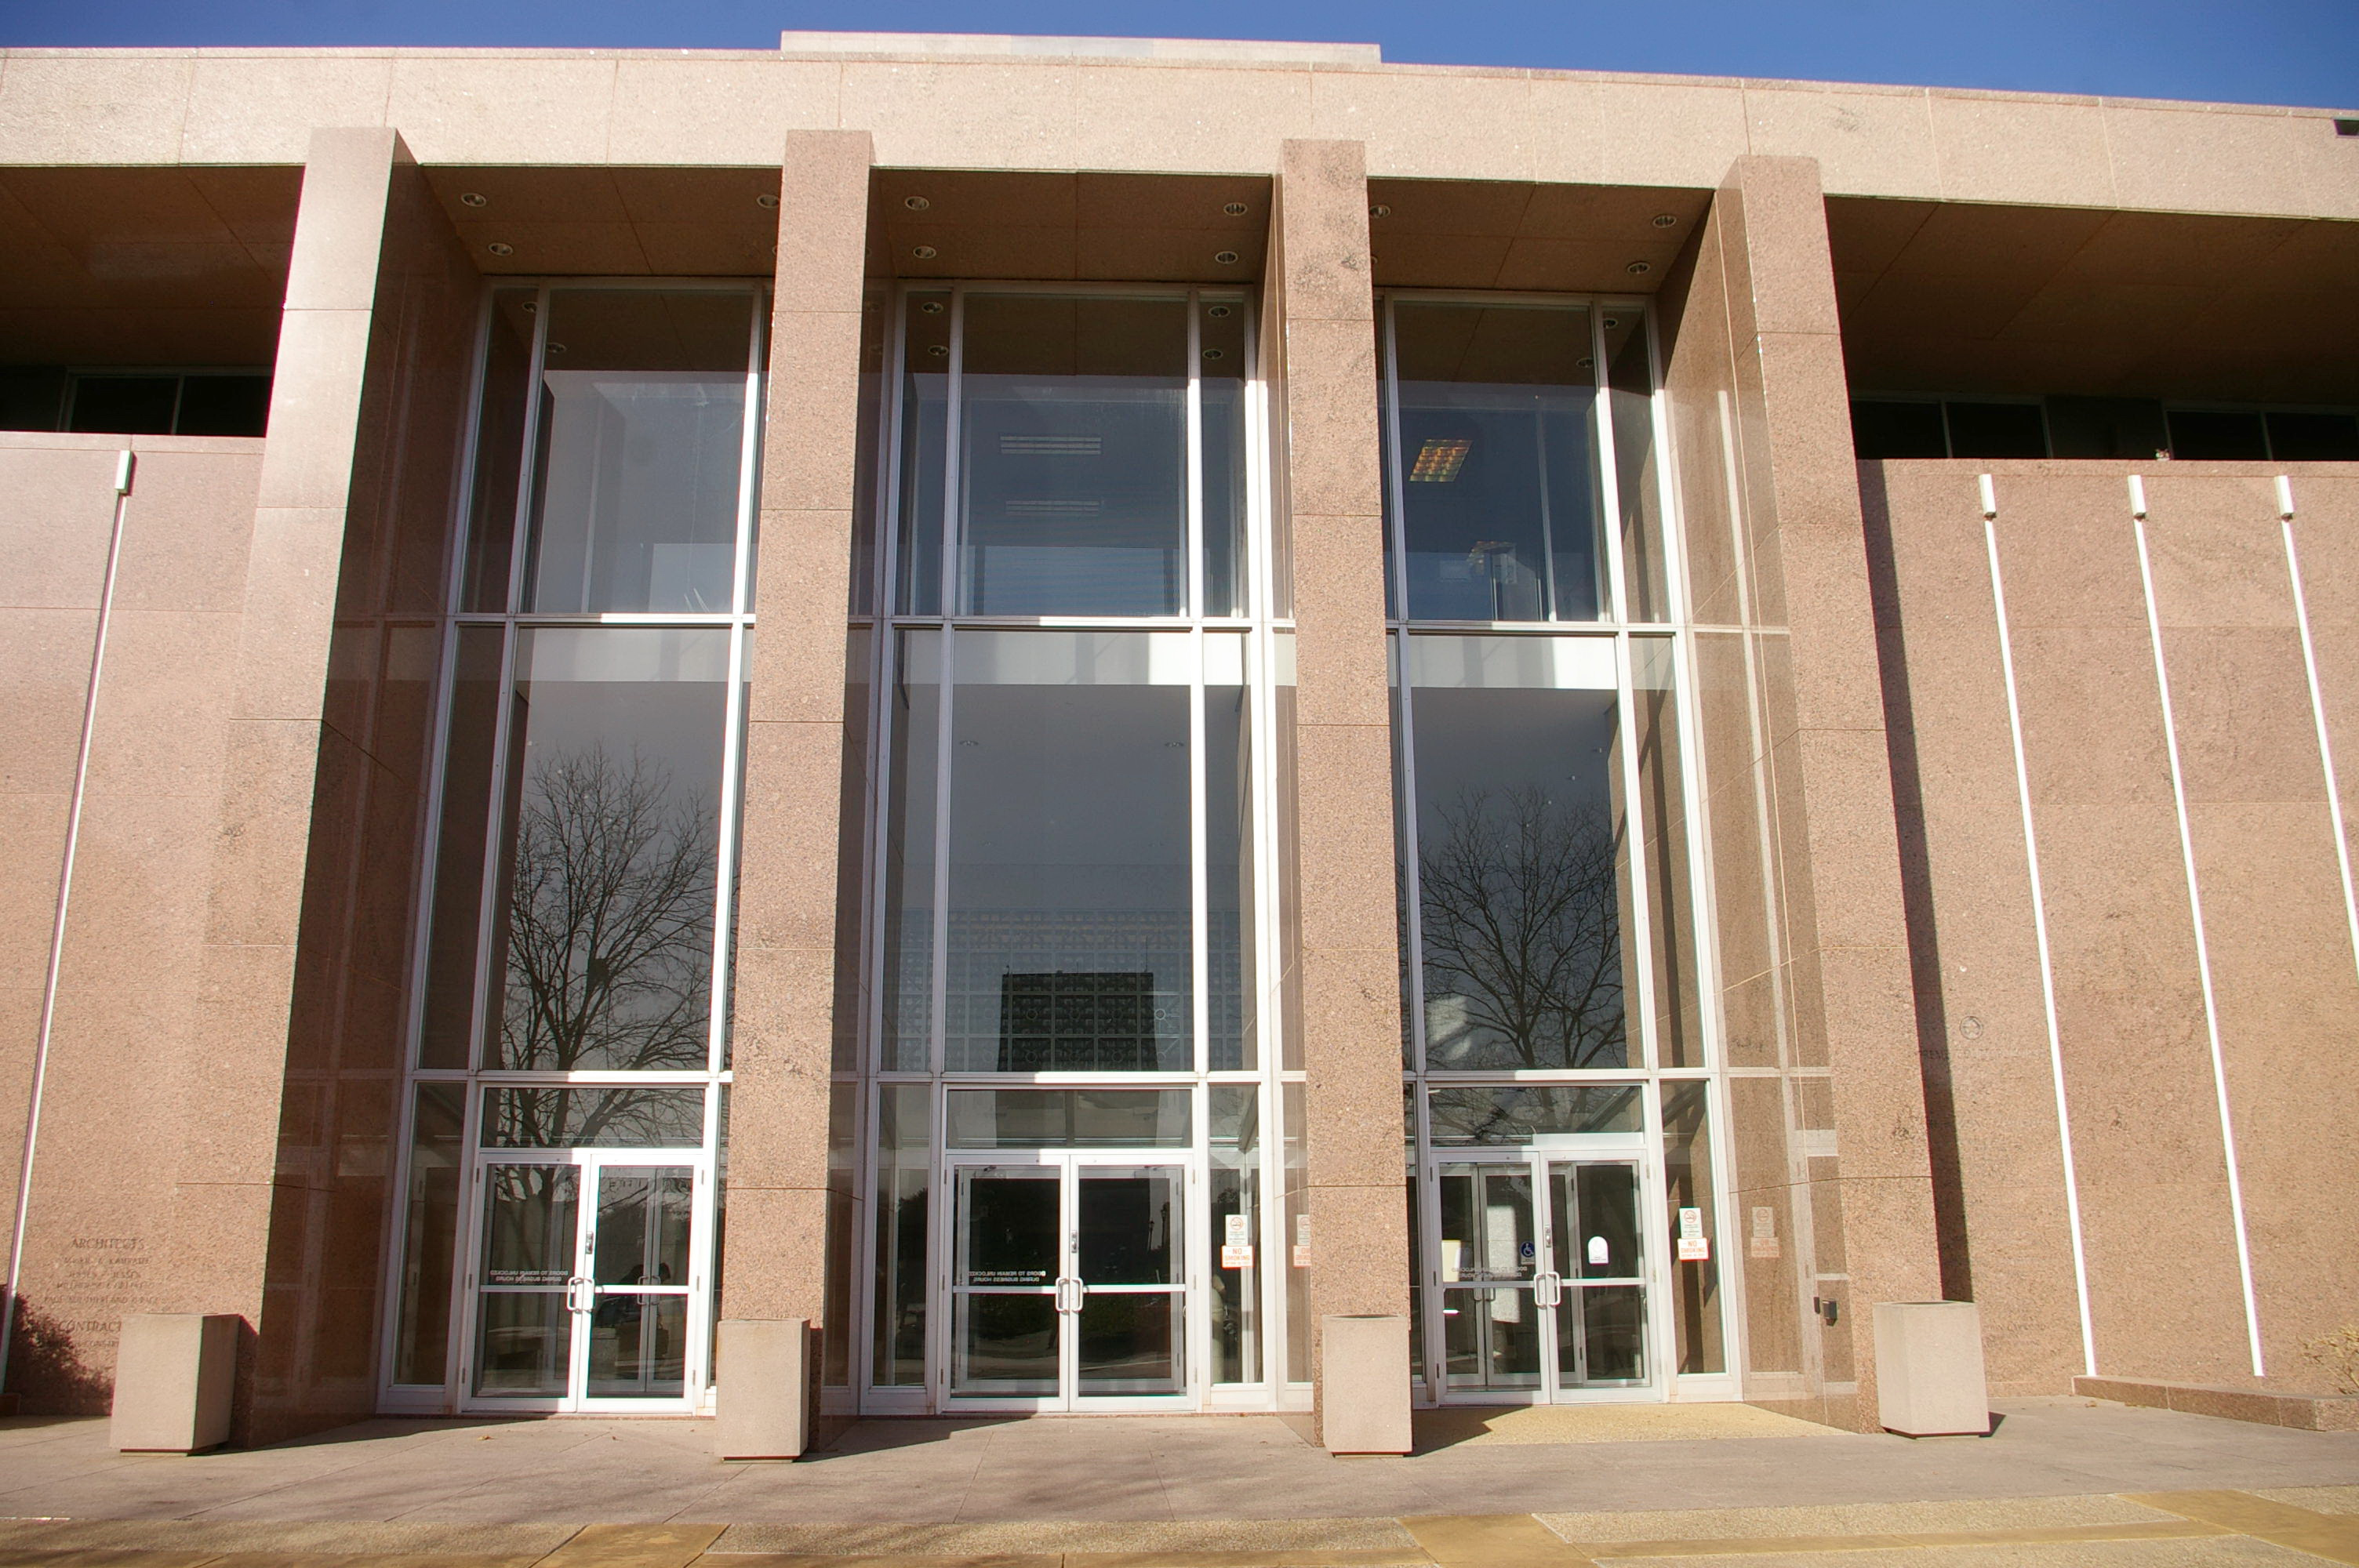 Texas Supreme Court Us Courthouses